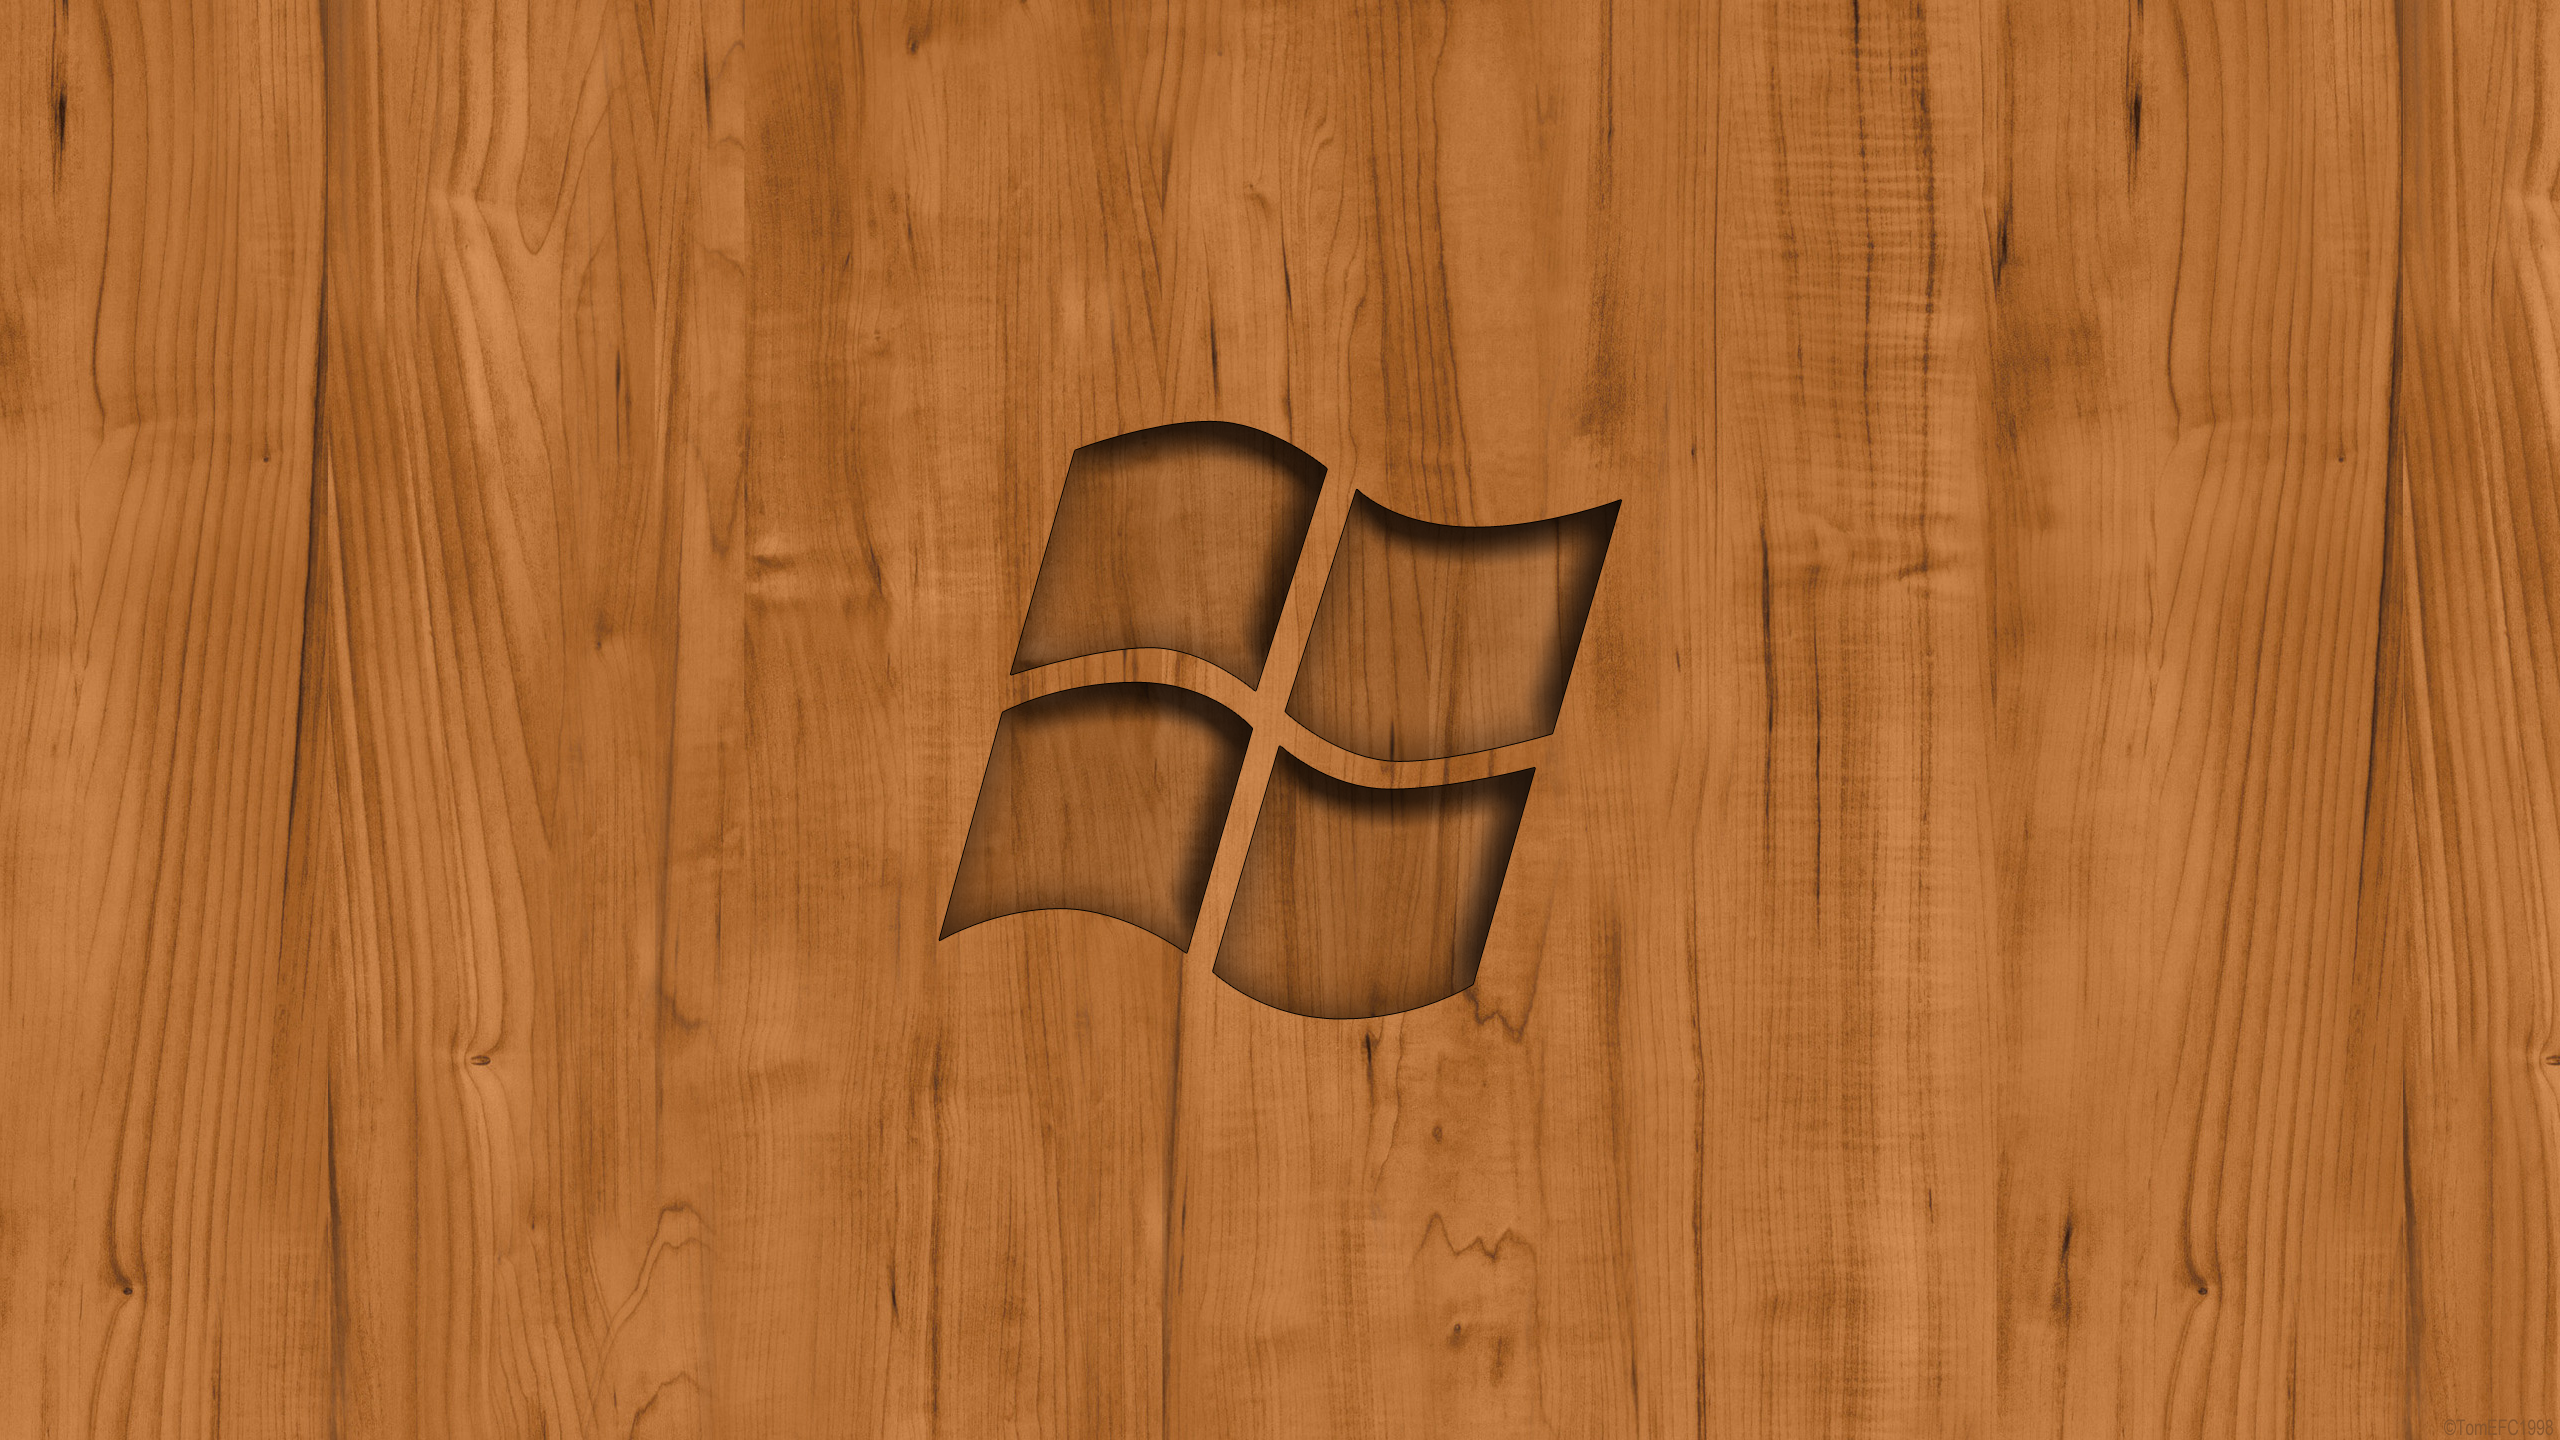 Windows Wood Wallpaper by TomEFC98 on DeviantArt. Wood Wallpapers   WallpaperSafari